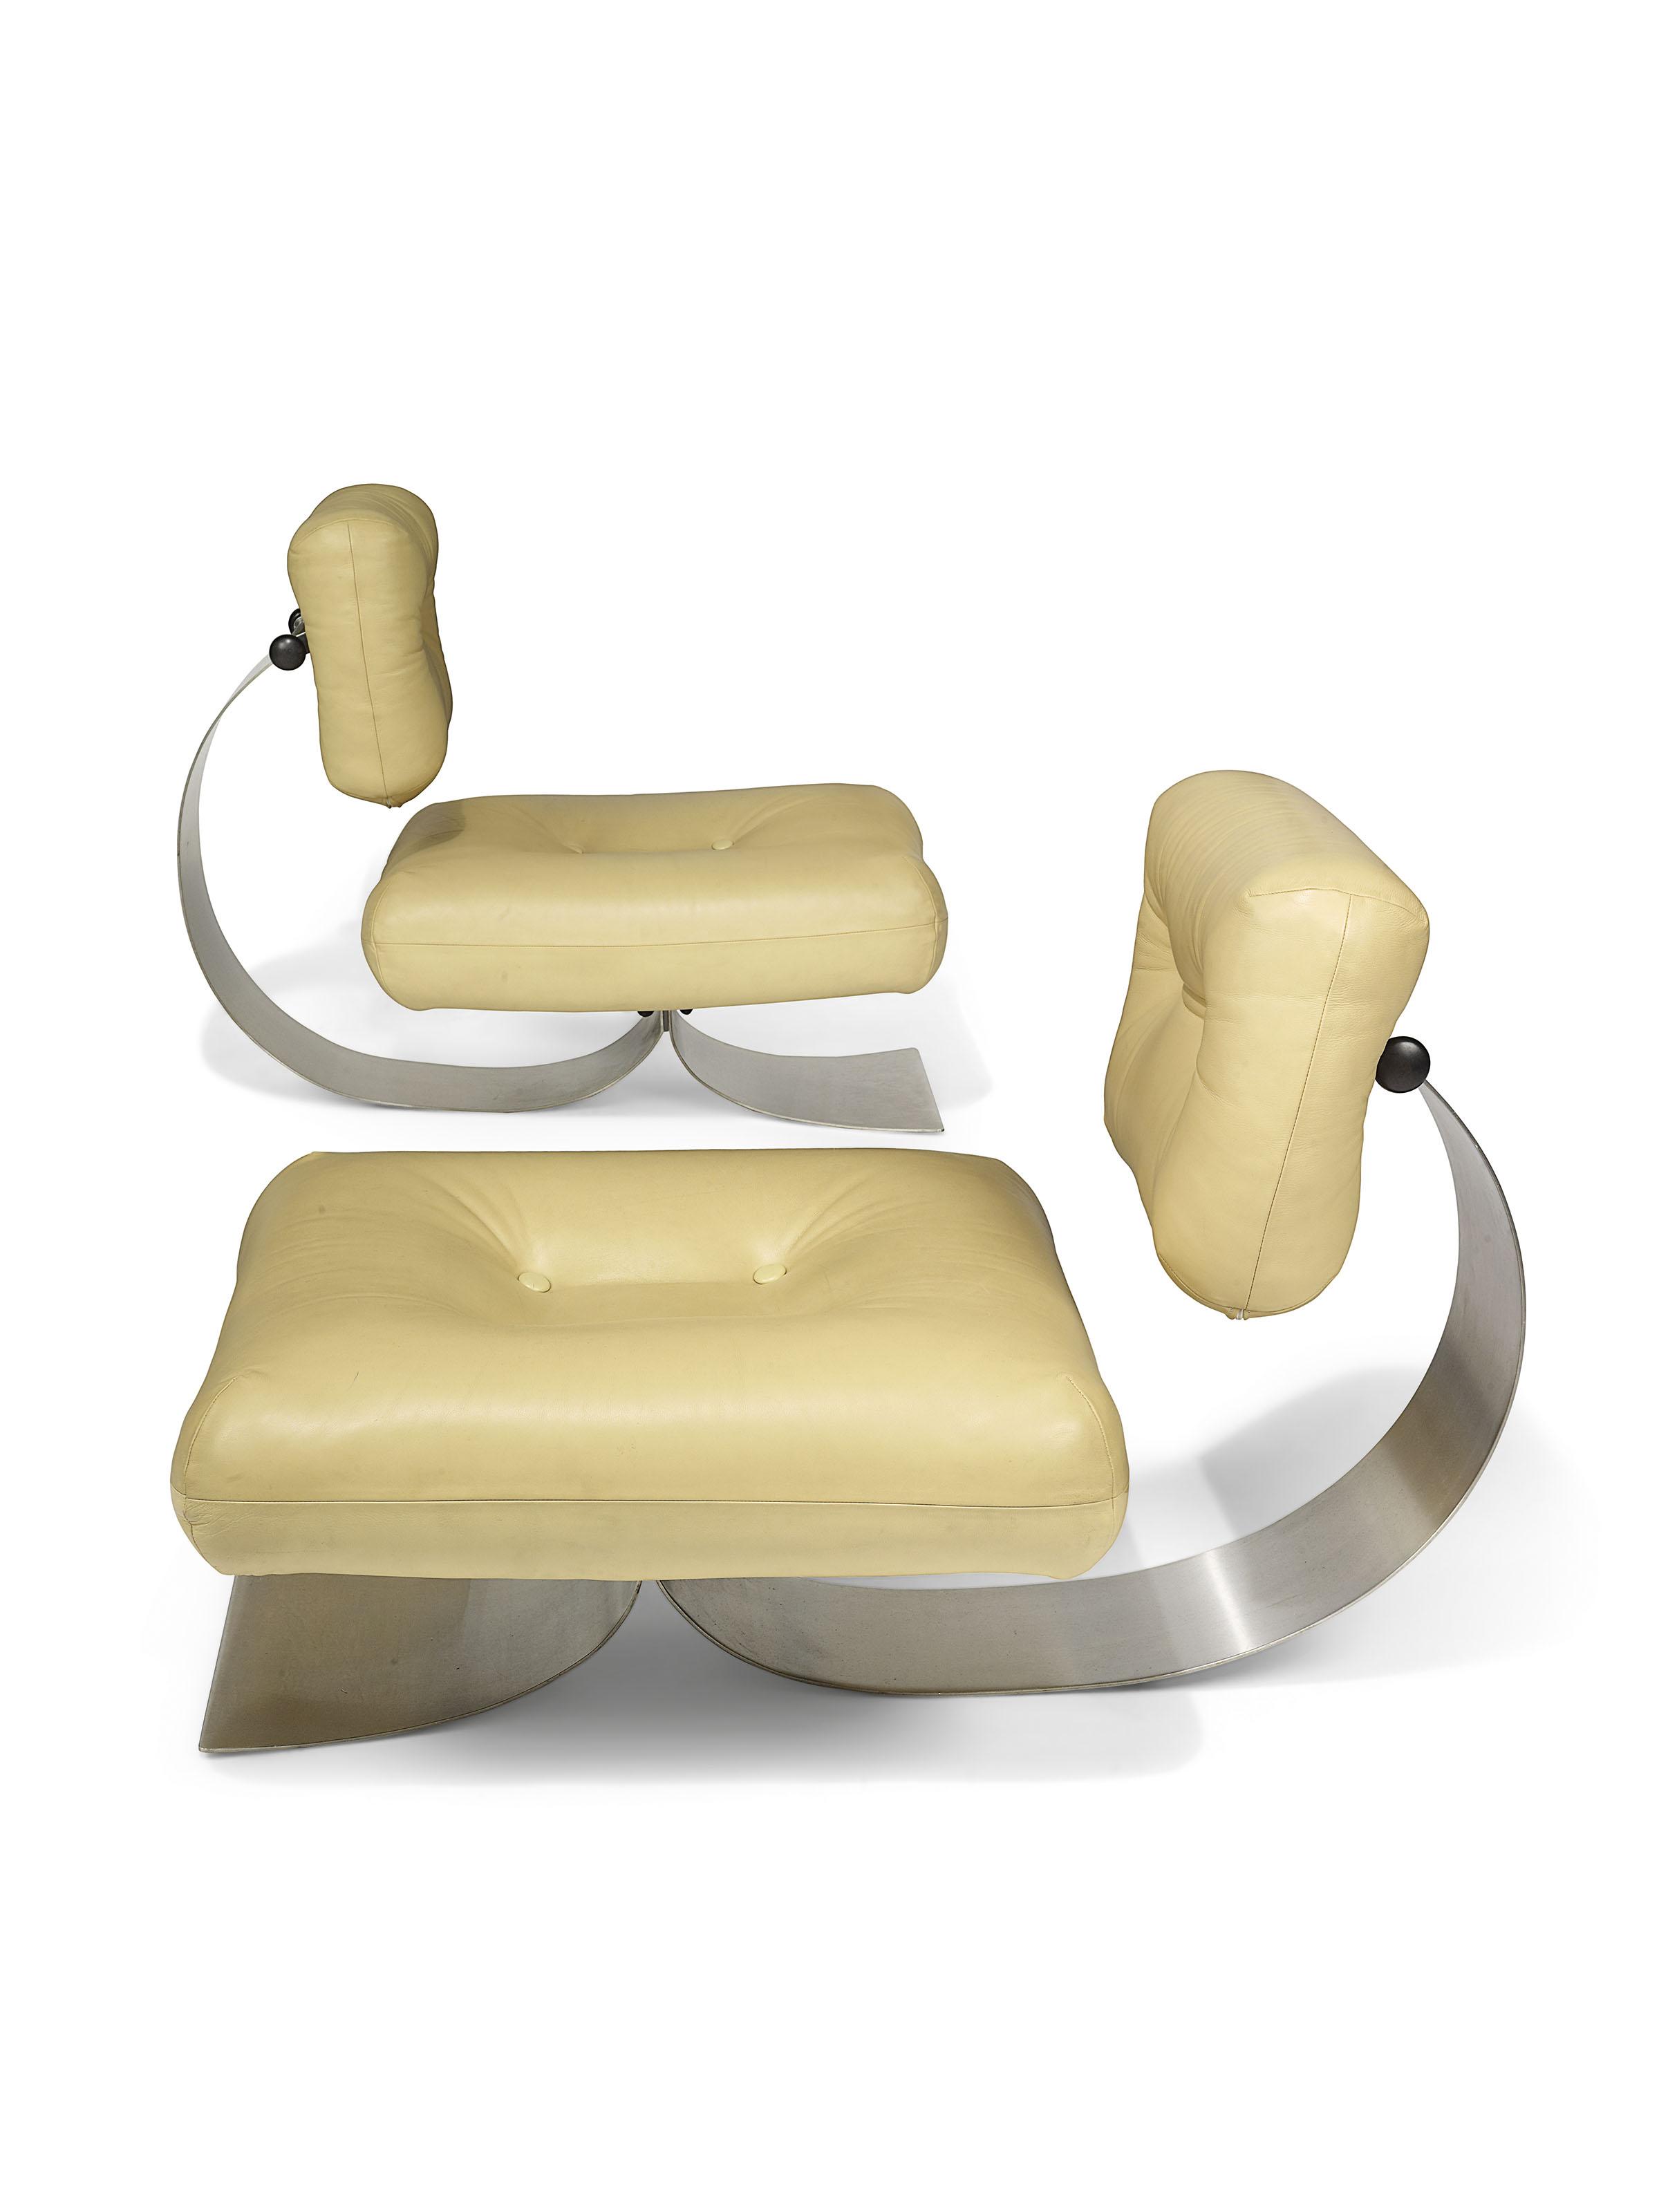 oscar niemeyer 1907 2012 anna maria niemeyer 1929. Black Bedroom Furniture Sets. Home Design Ideas